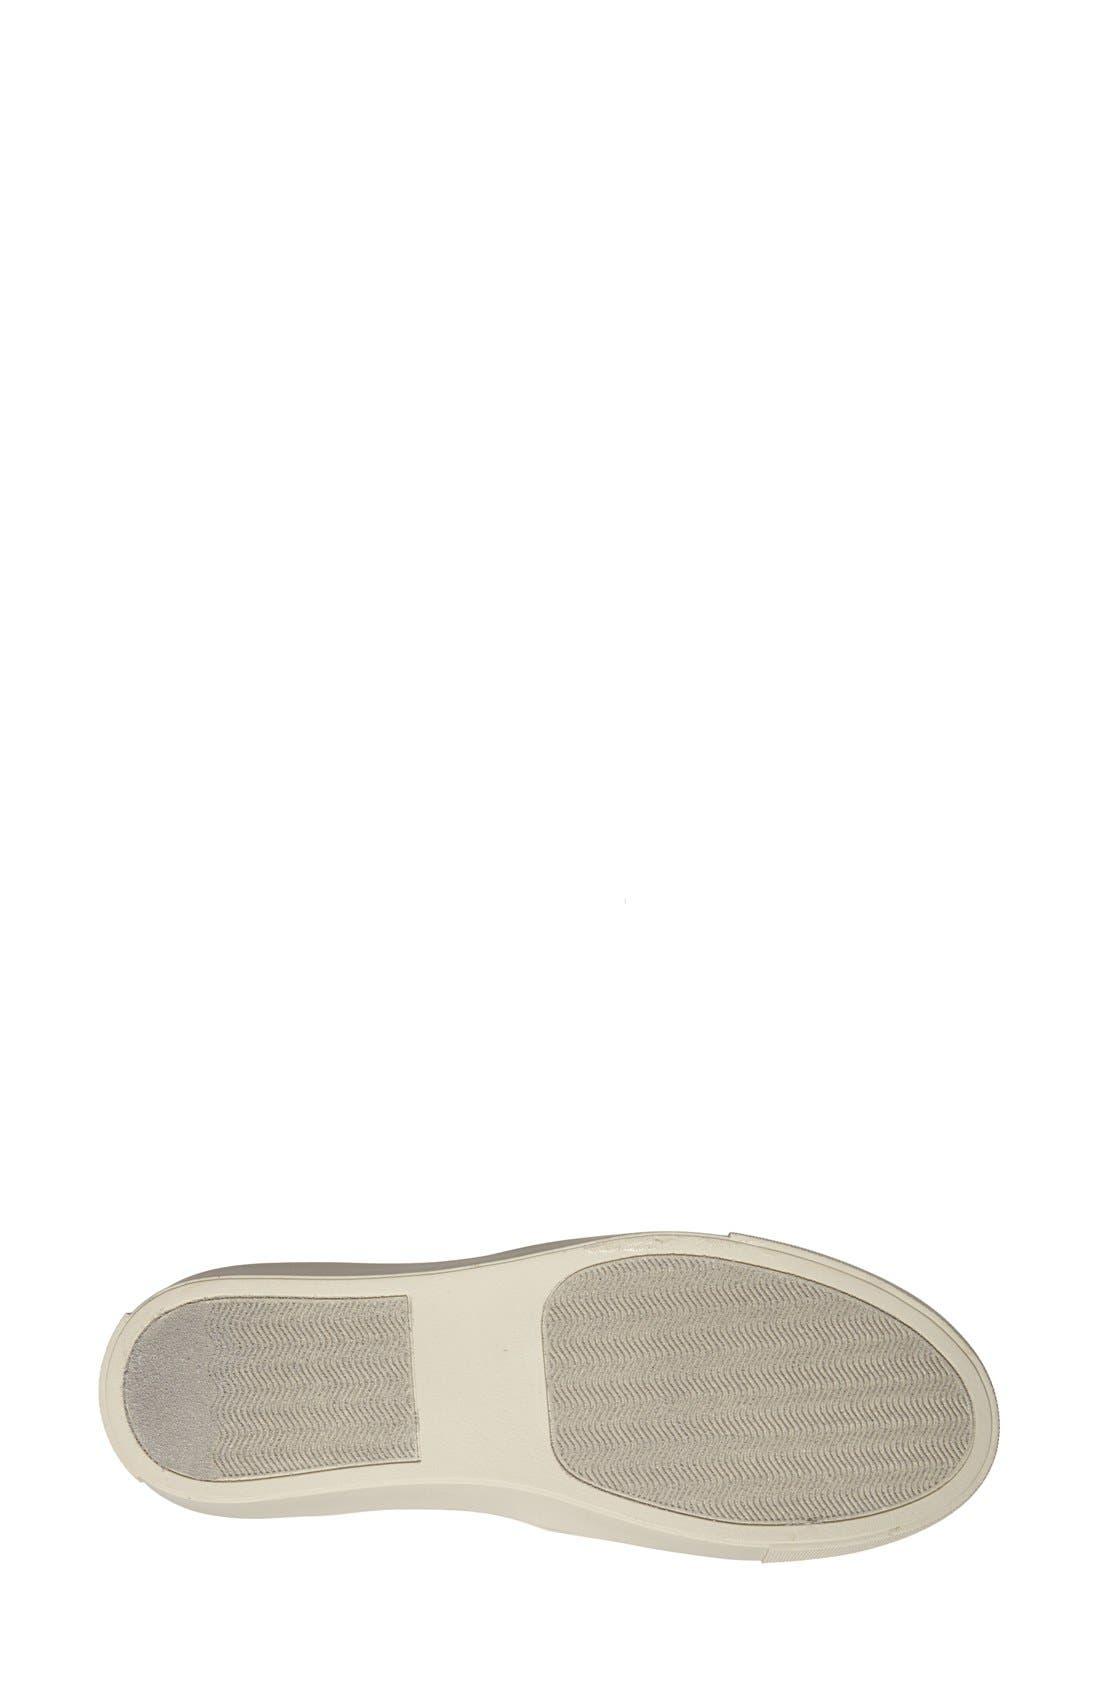 STEVE MADDEN, Ecentrcq Sneaker, Alternate thumbnail 4, color, BLACK FAUX LEATHER